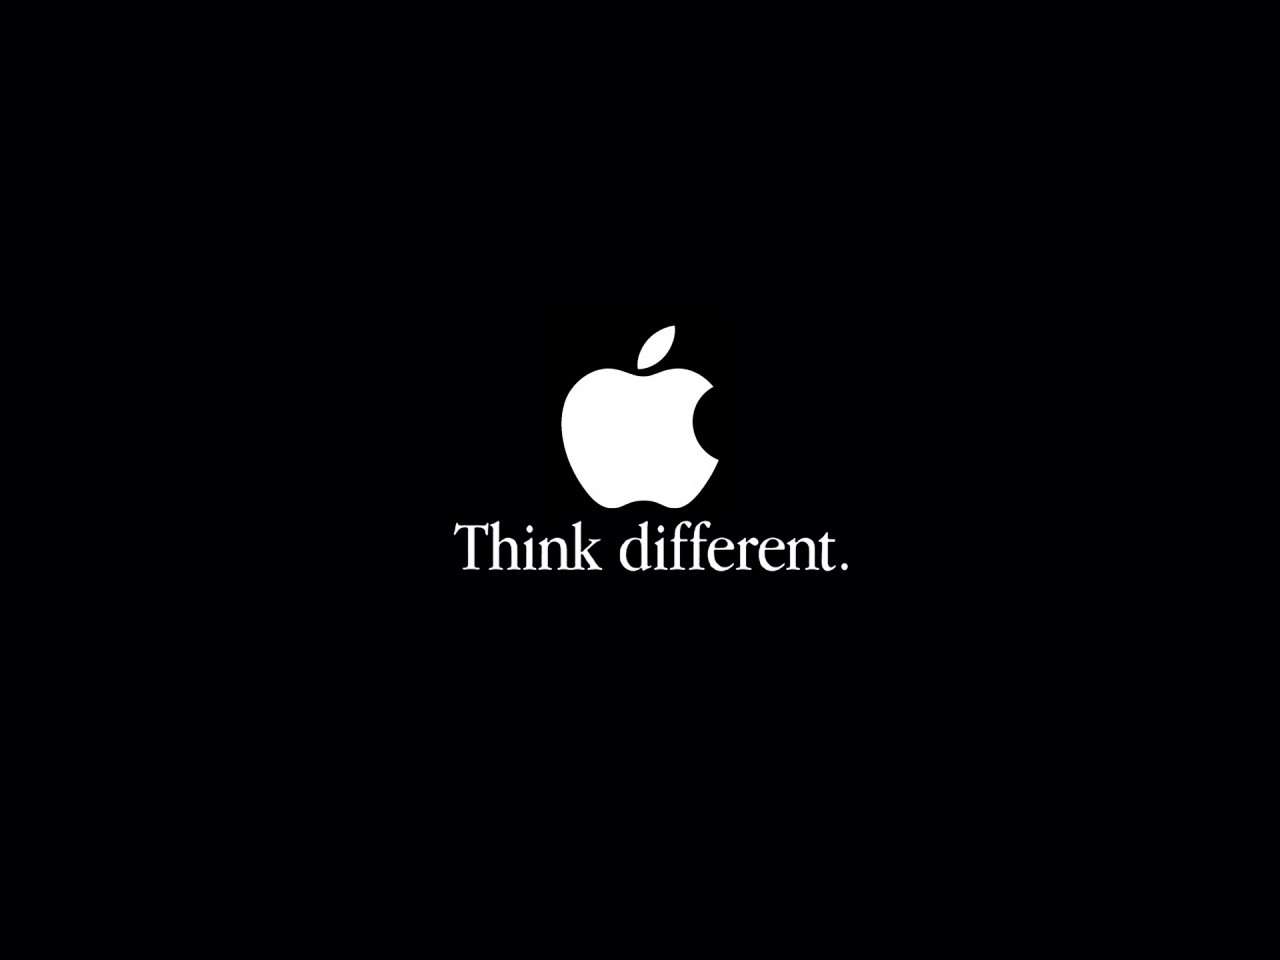 Eslogan de Apple